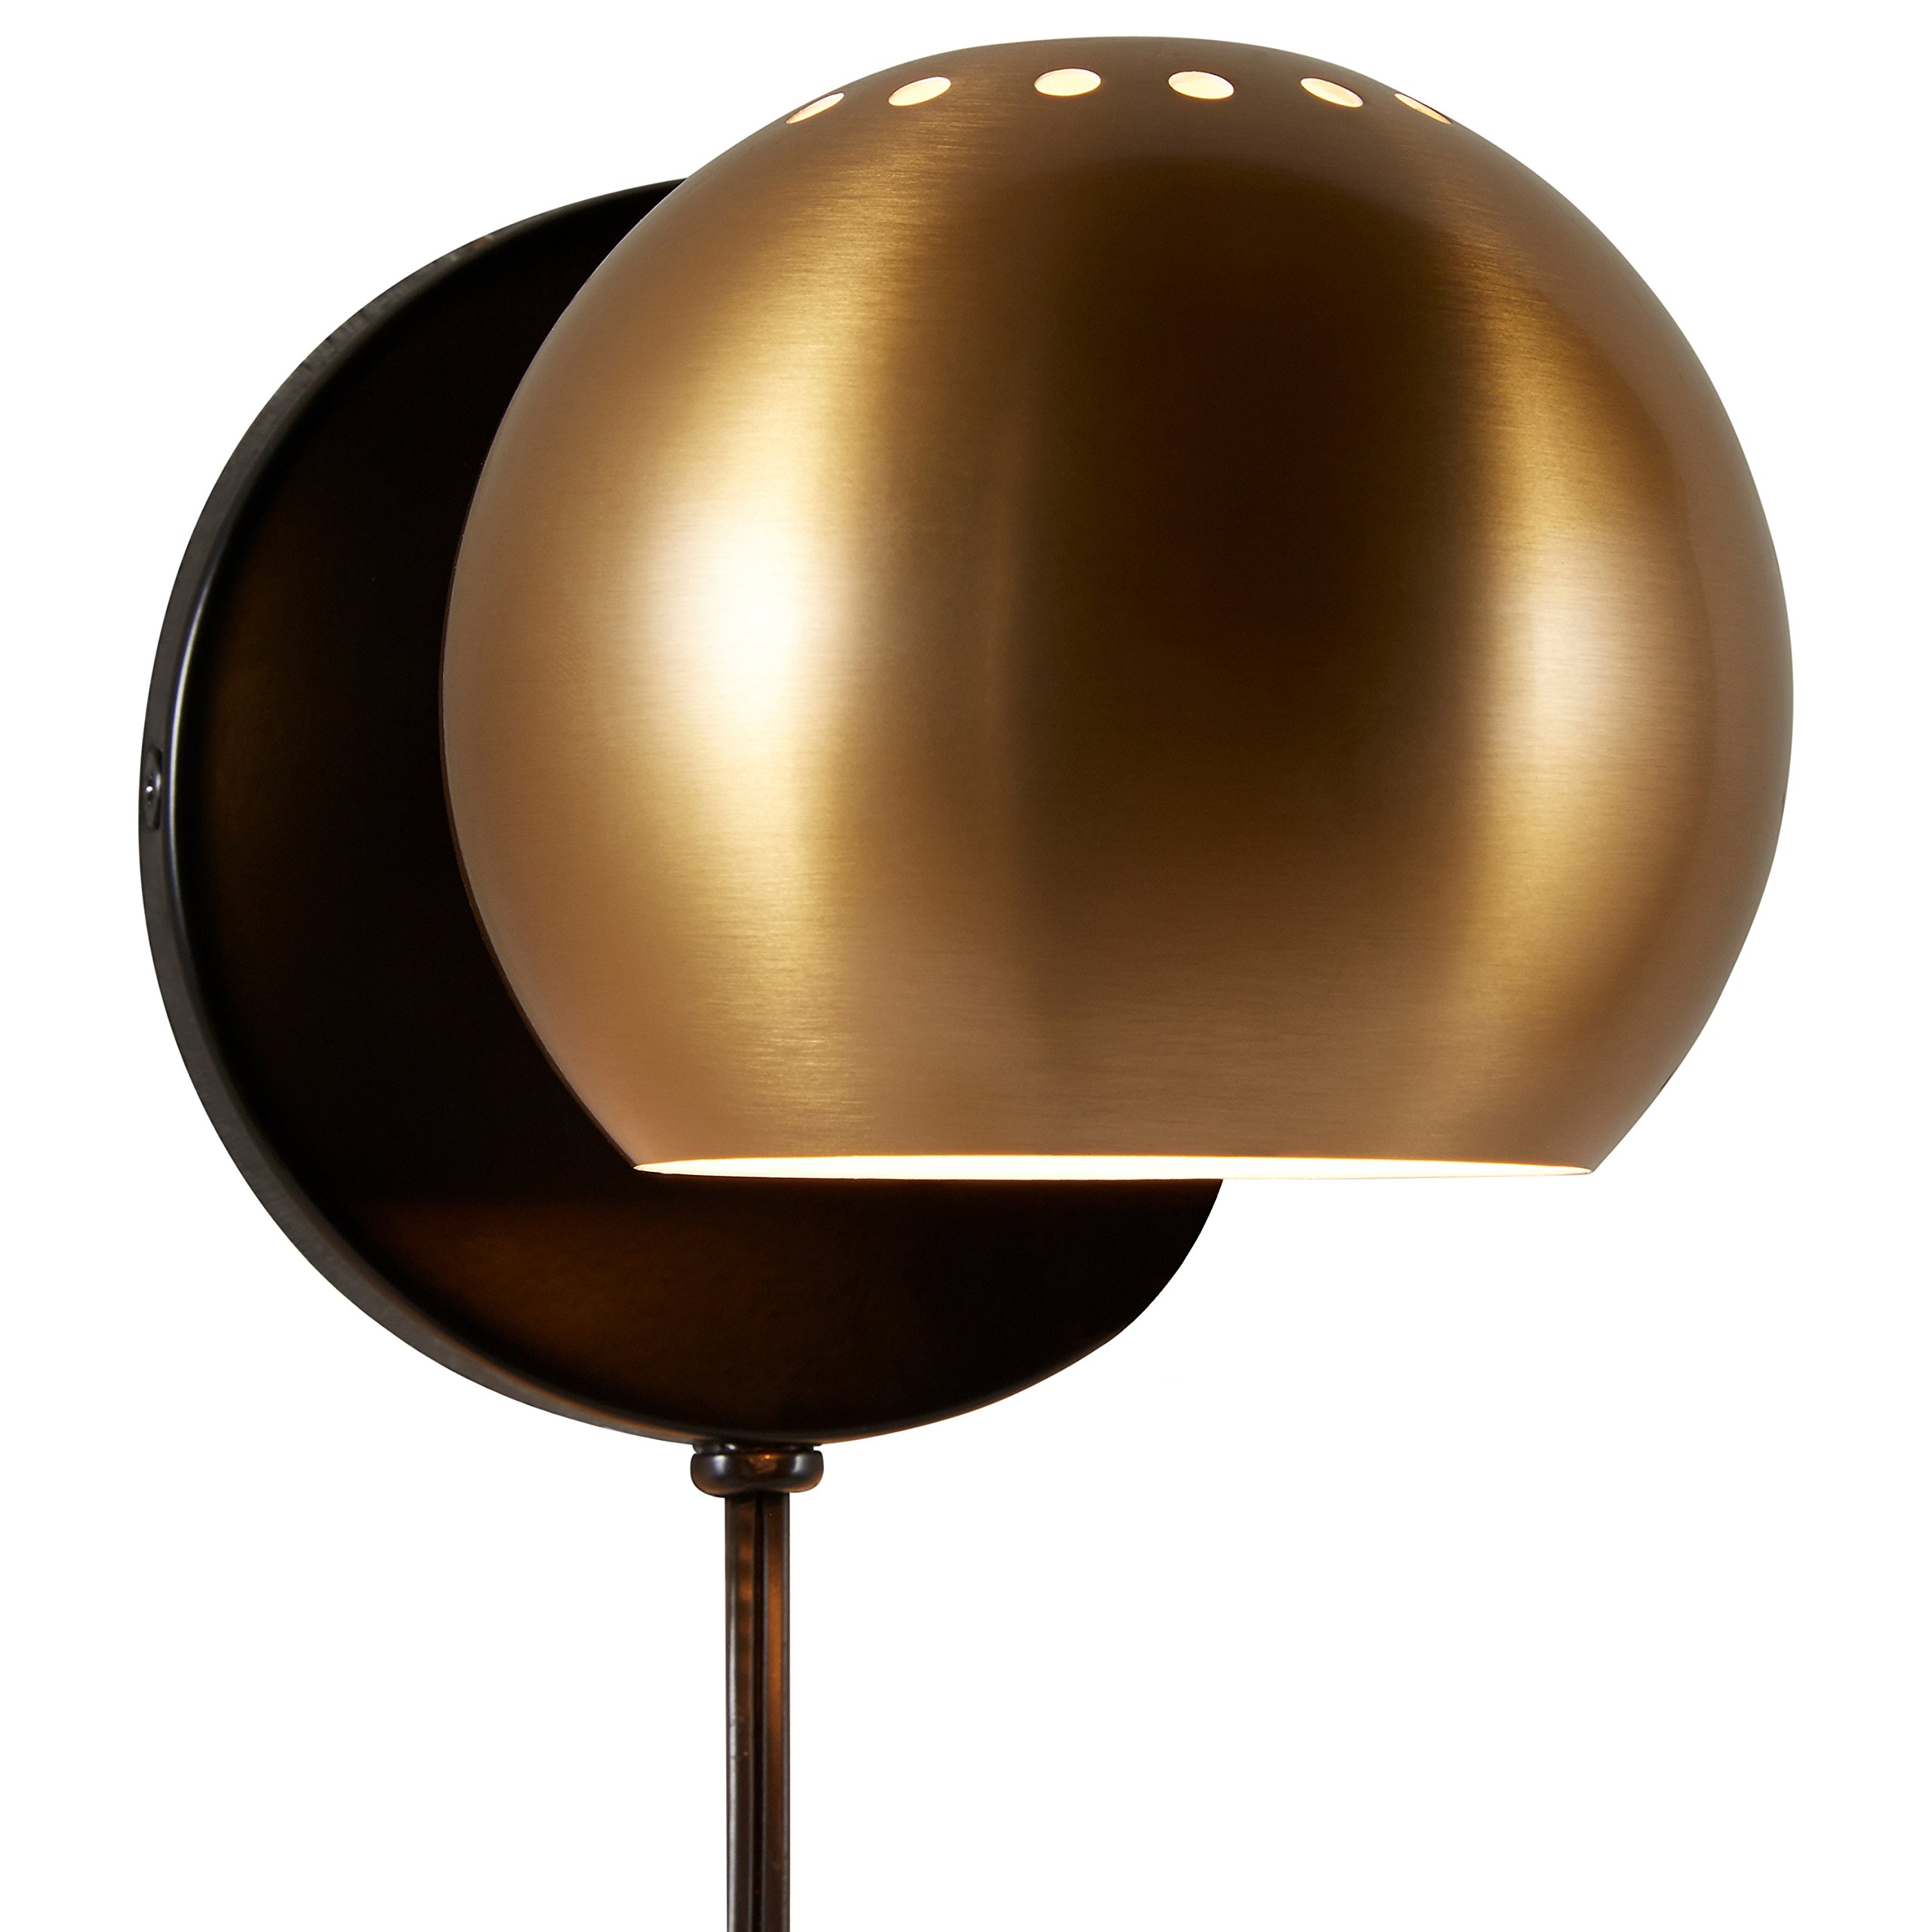 Rivet Gold Metal Plug-in Wall Sconce Light, 7''H, Gold Metal